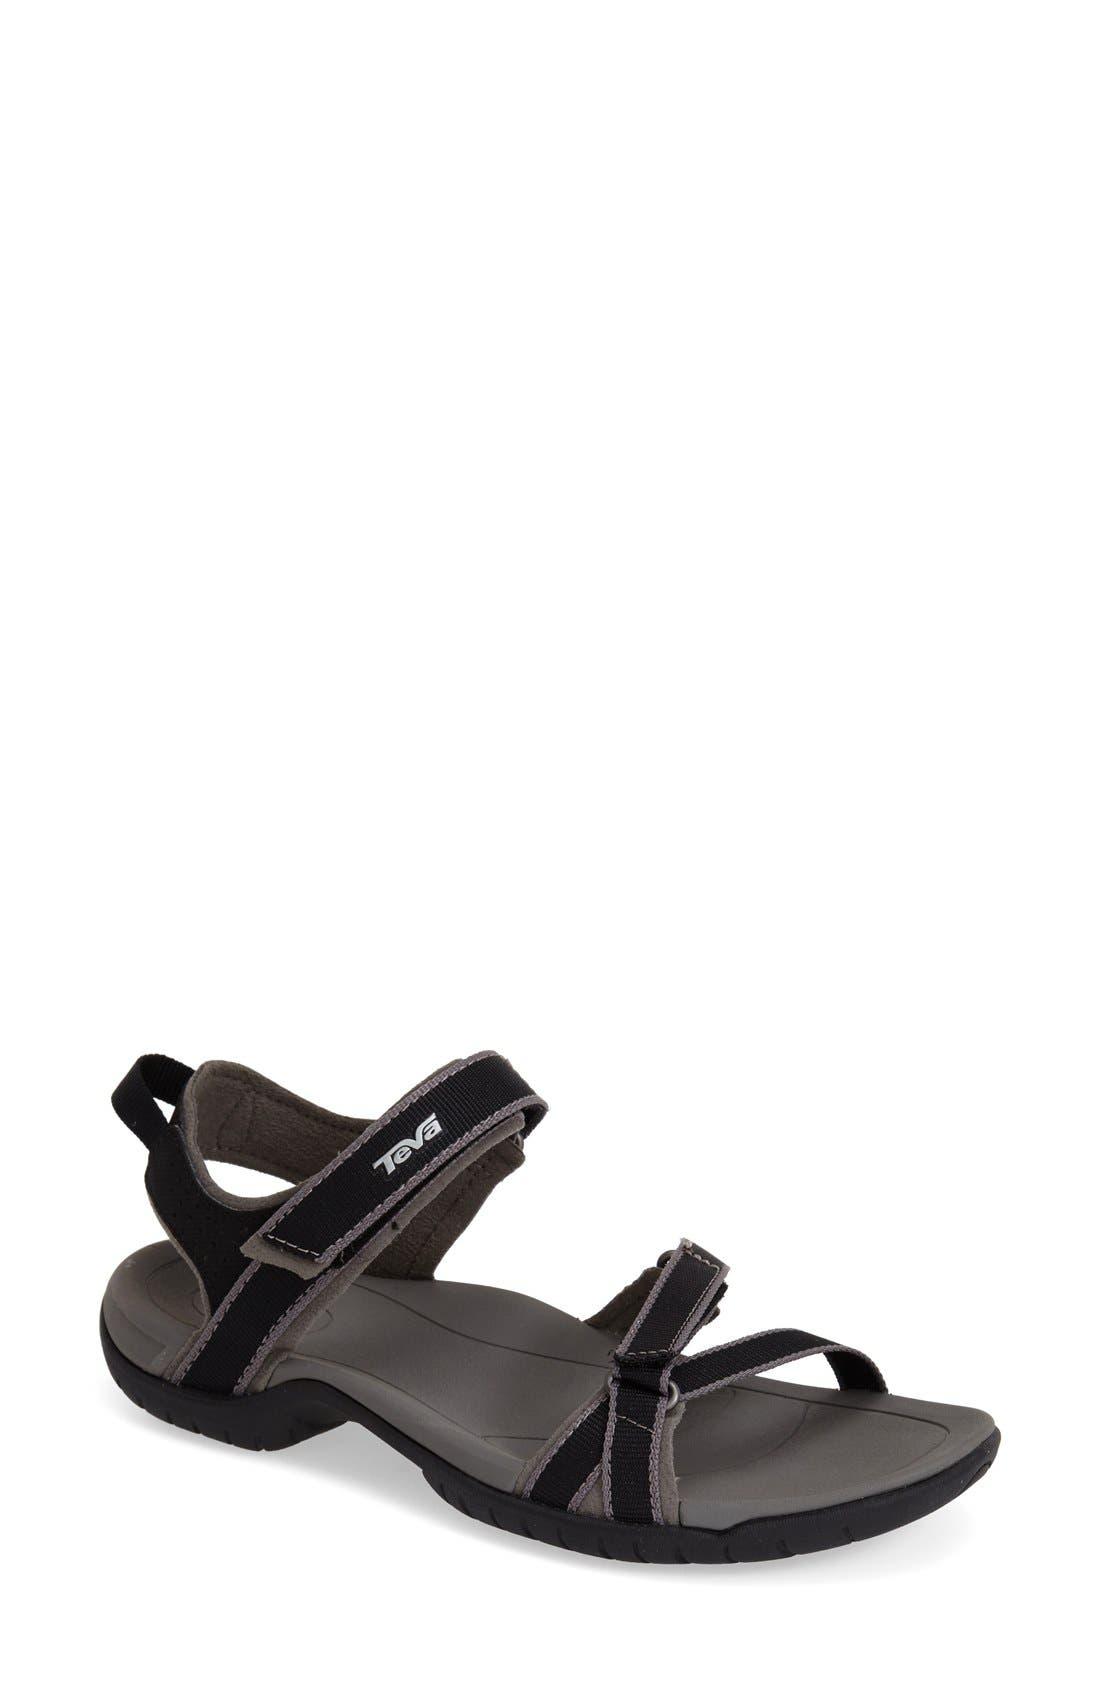 'Verra' Sandal,                             Main thumbnail 1, color,                             Black/ Grey